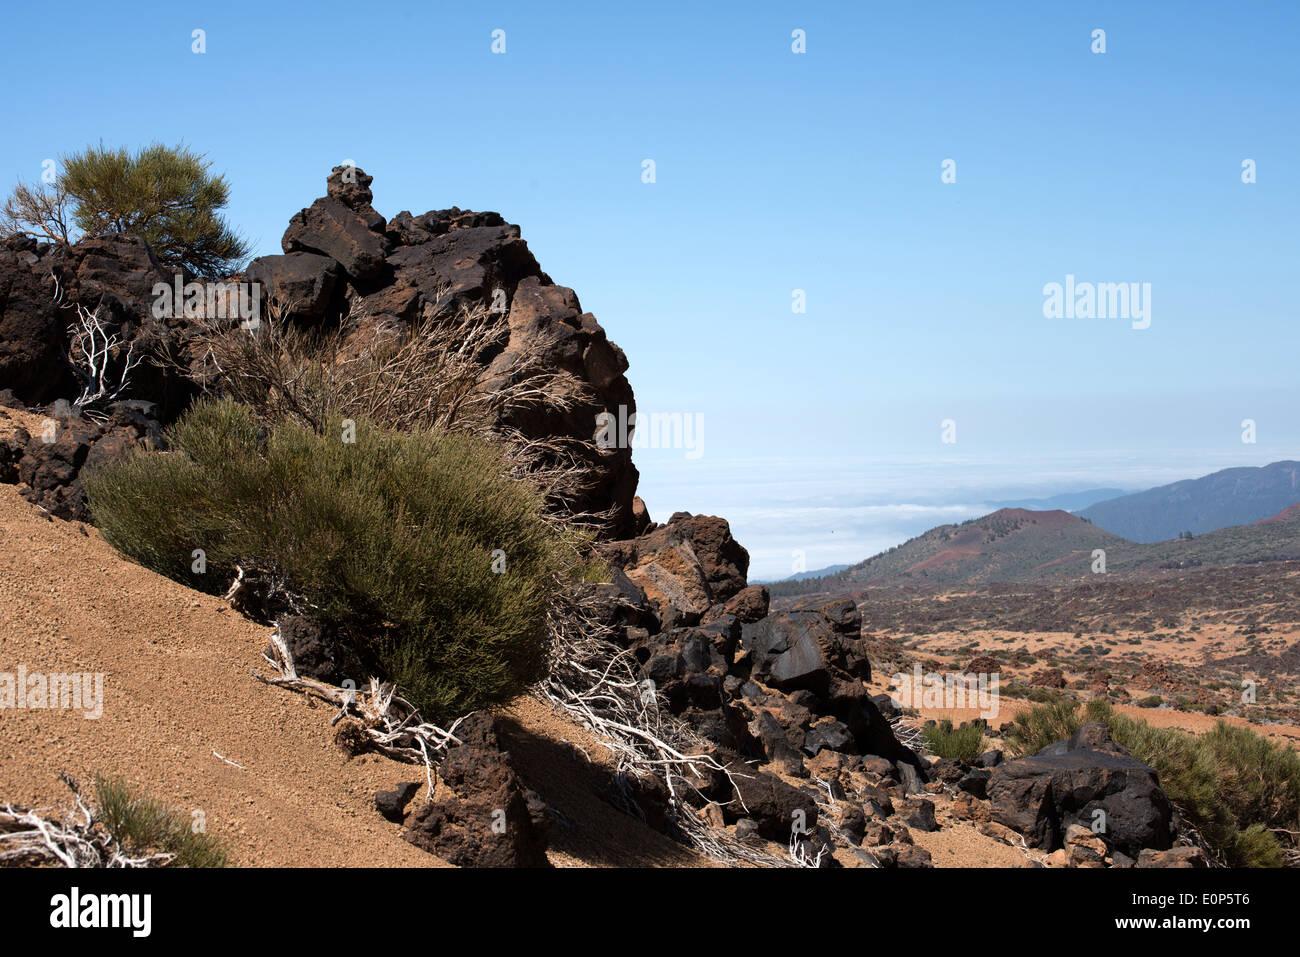 Tenerife, lava covered landscape of the area around Mt Teide Stock Photo